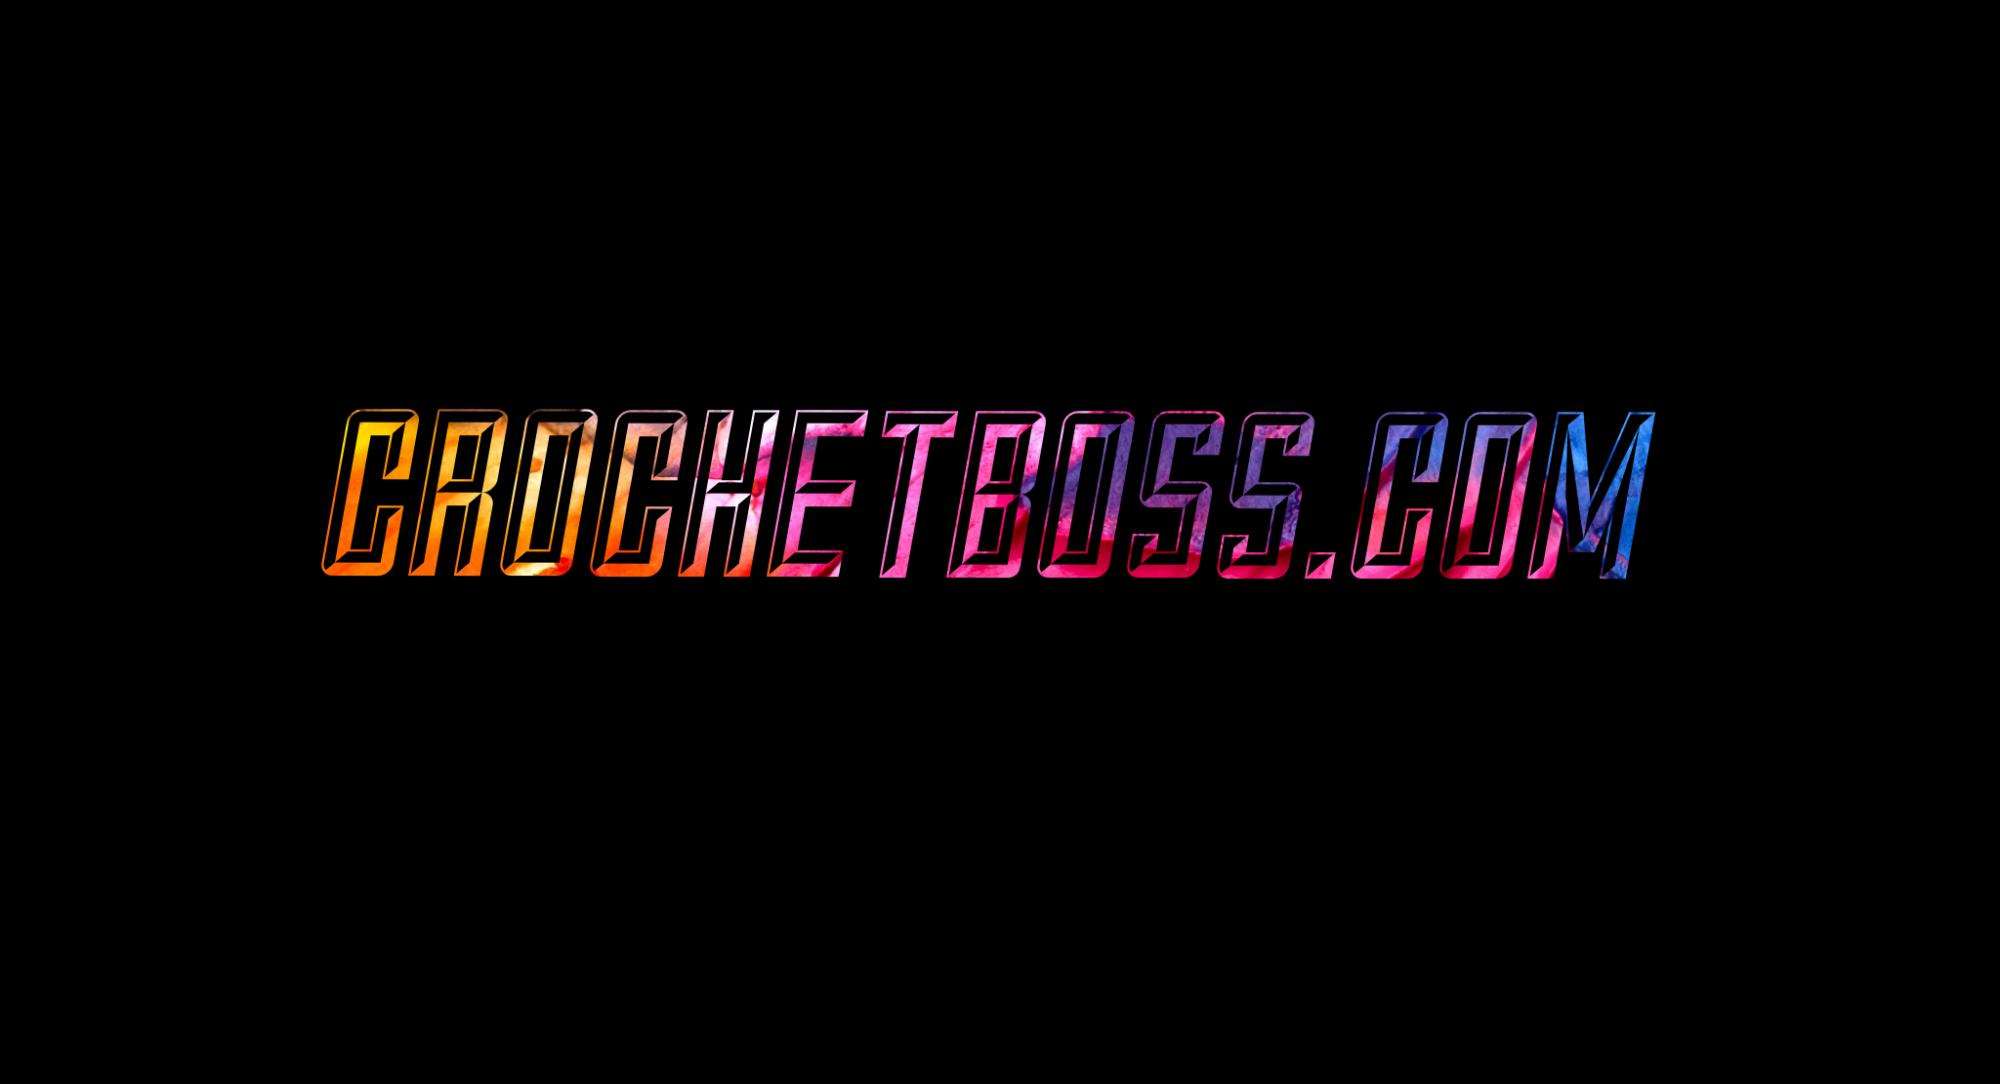 Crochet Boss